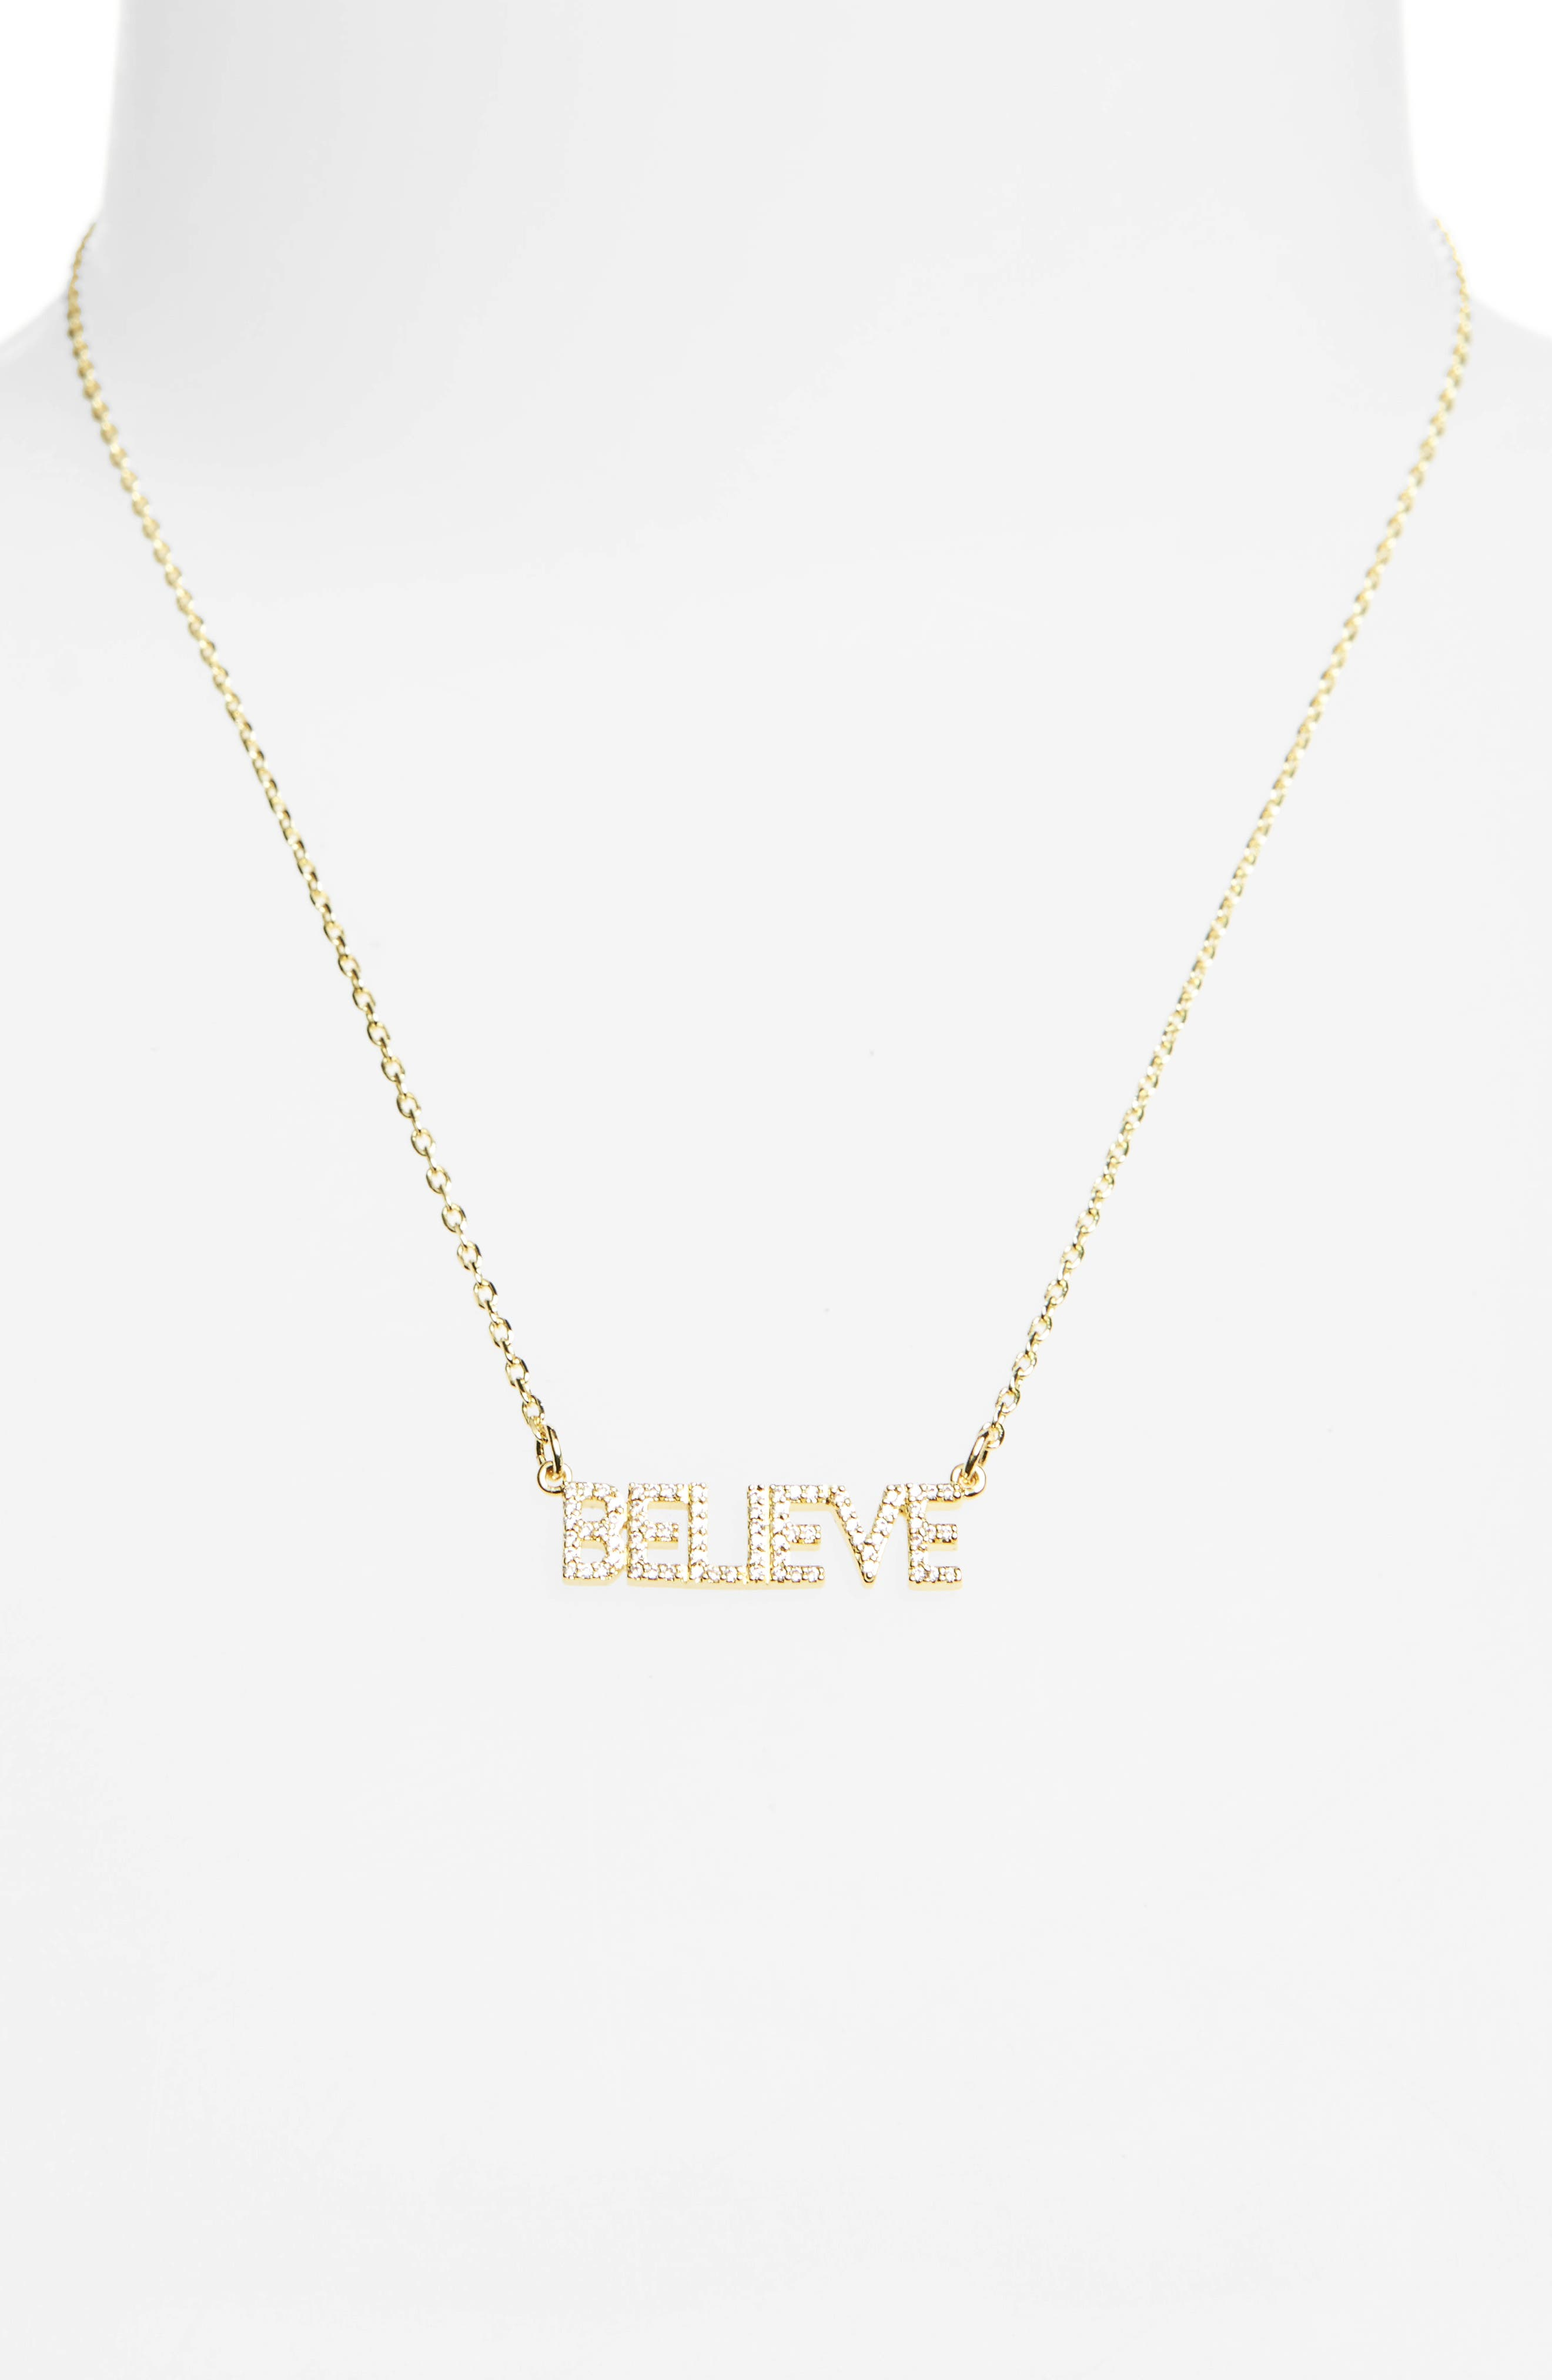 Believe Necklace,                             Alternate thumbnail 2, color,                             Gold